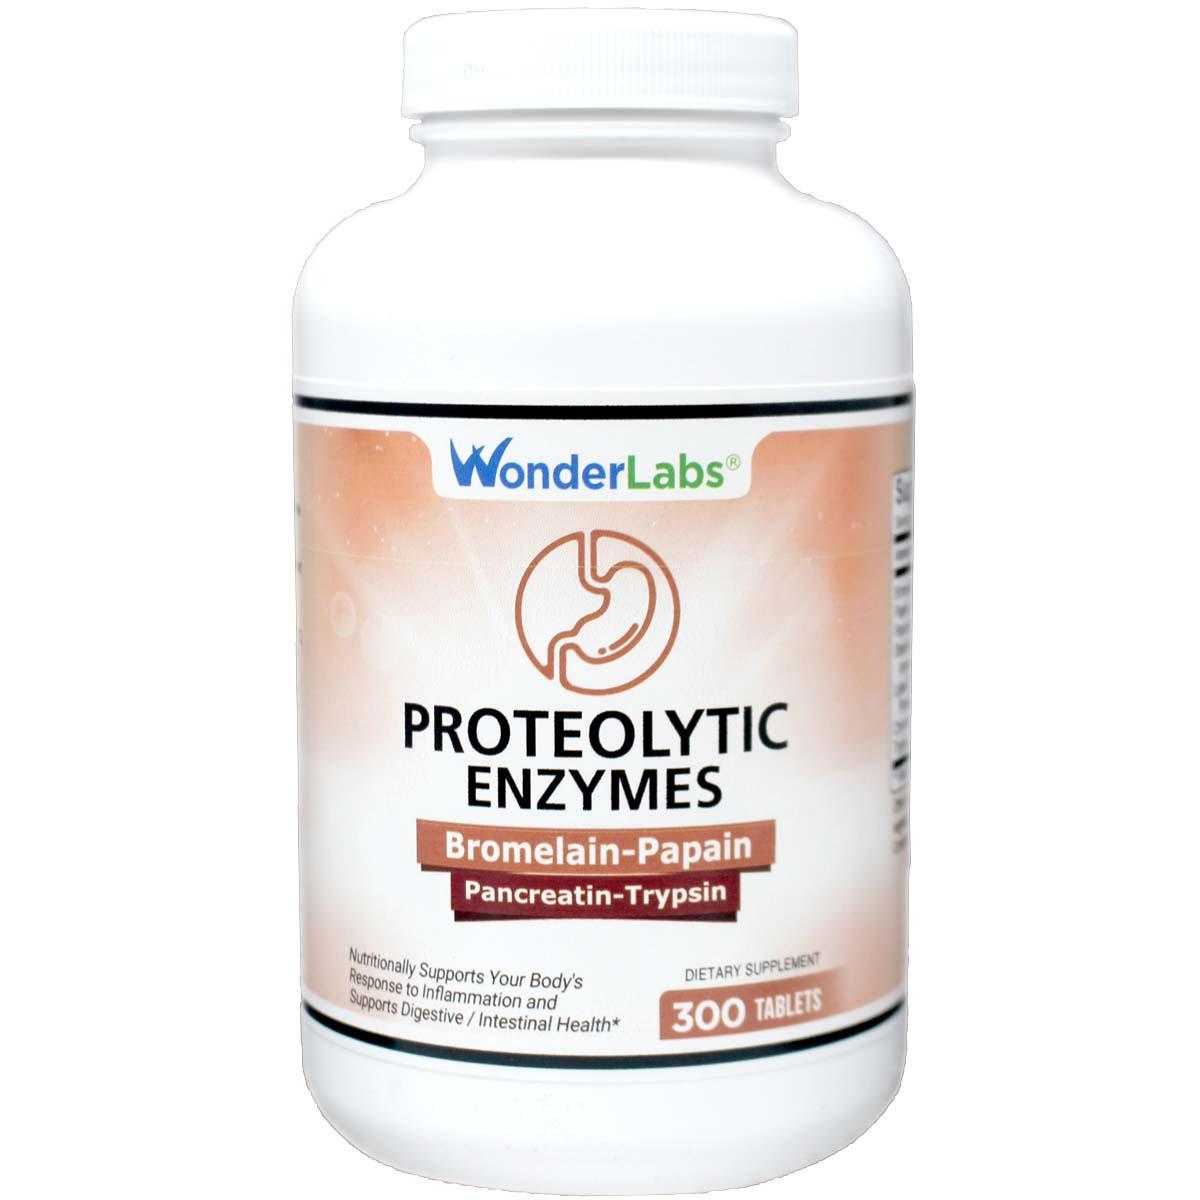 Proteolytic Enzymes | Bromelain Papain Pancreatin Trypsin